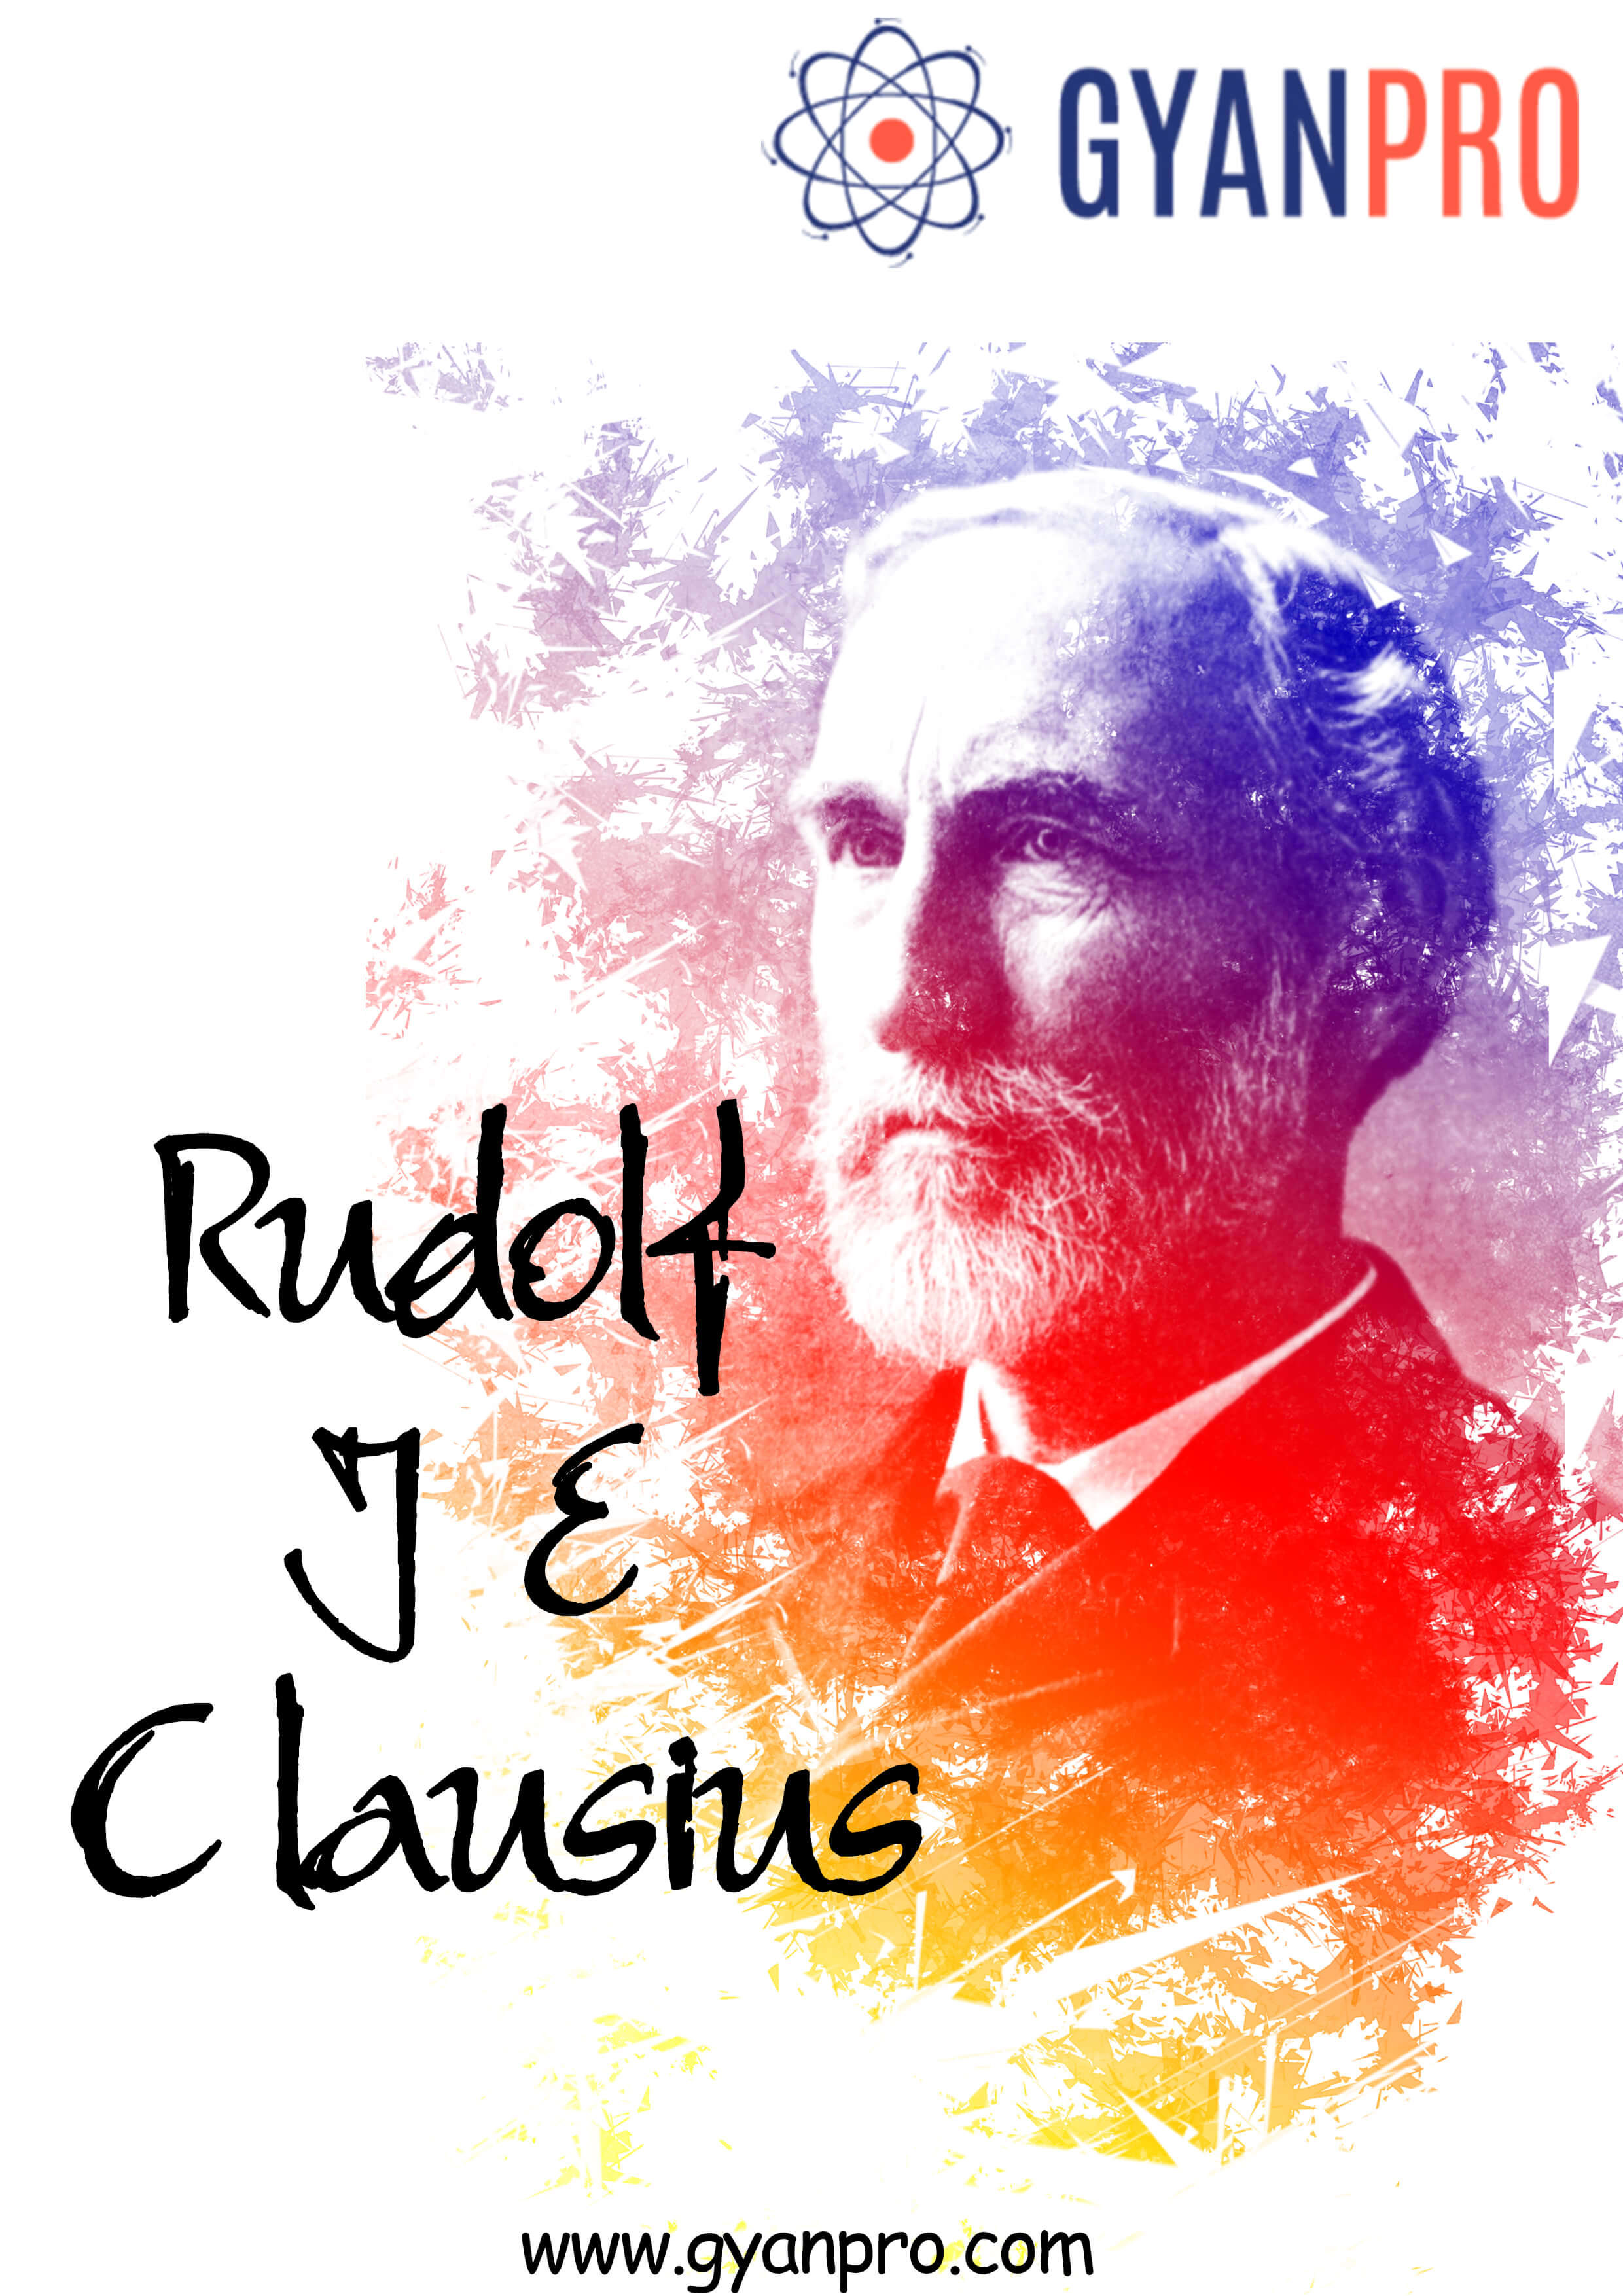 rudolf j e clausius_gyanpro